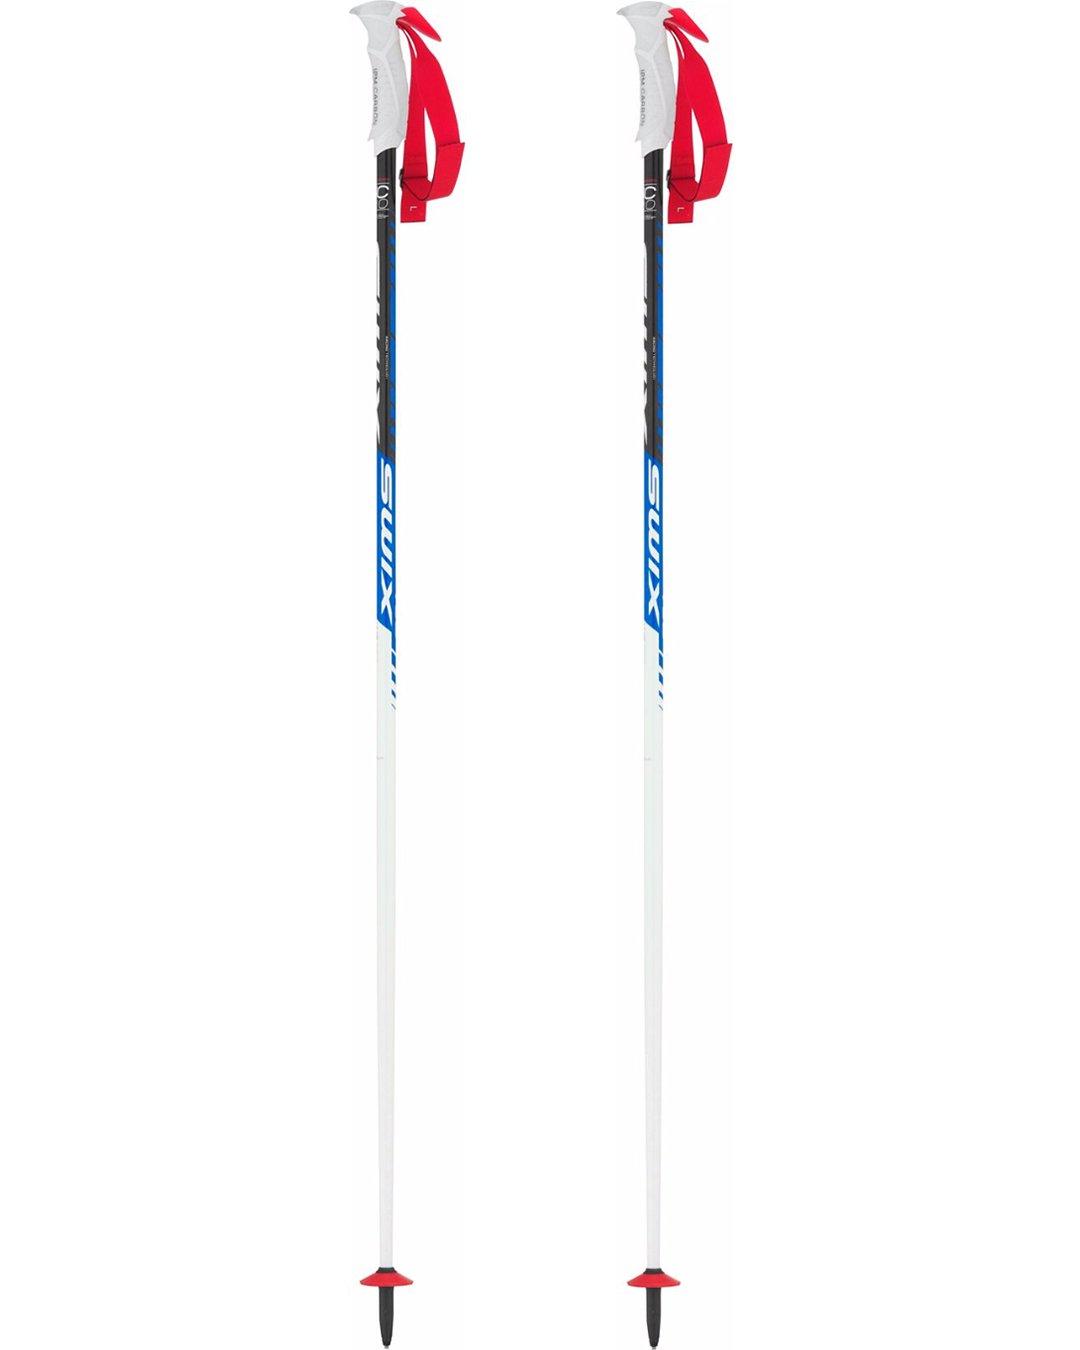 Swix WC Pro SL Premium Aluminum Slalom Race Poles